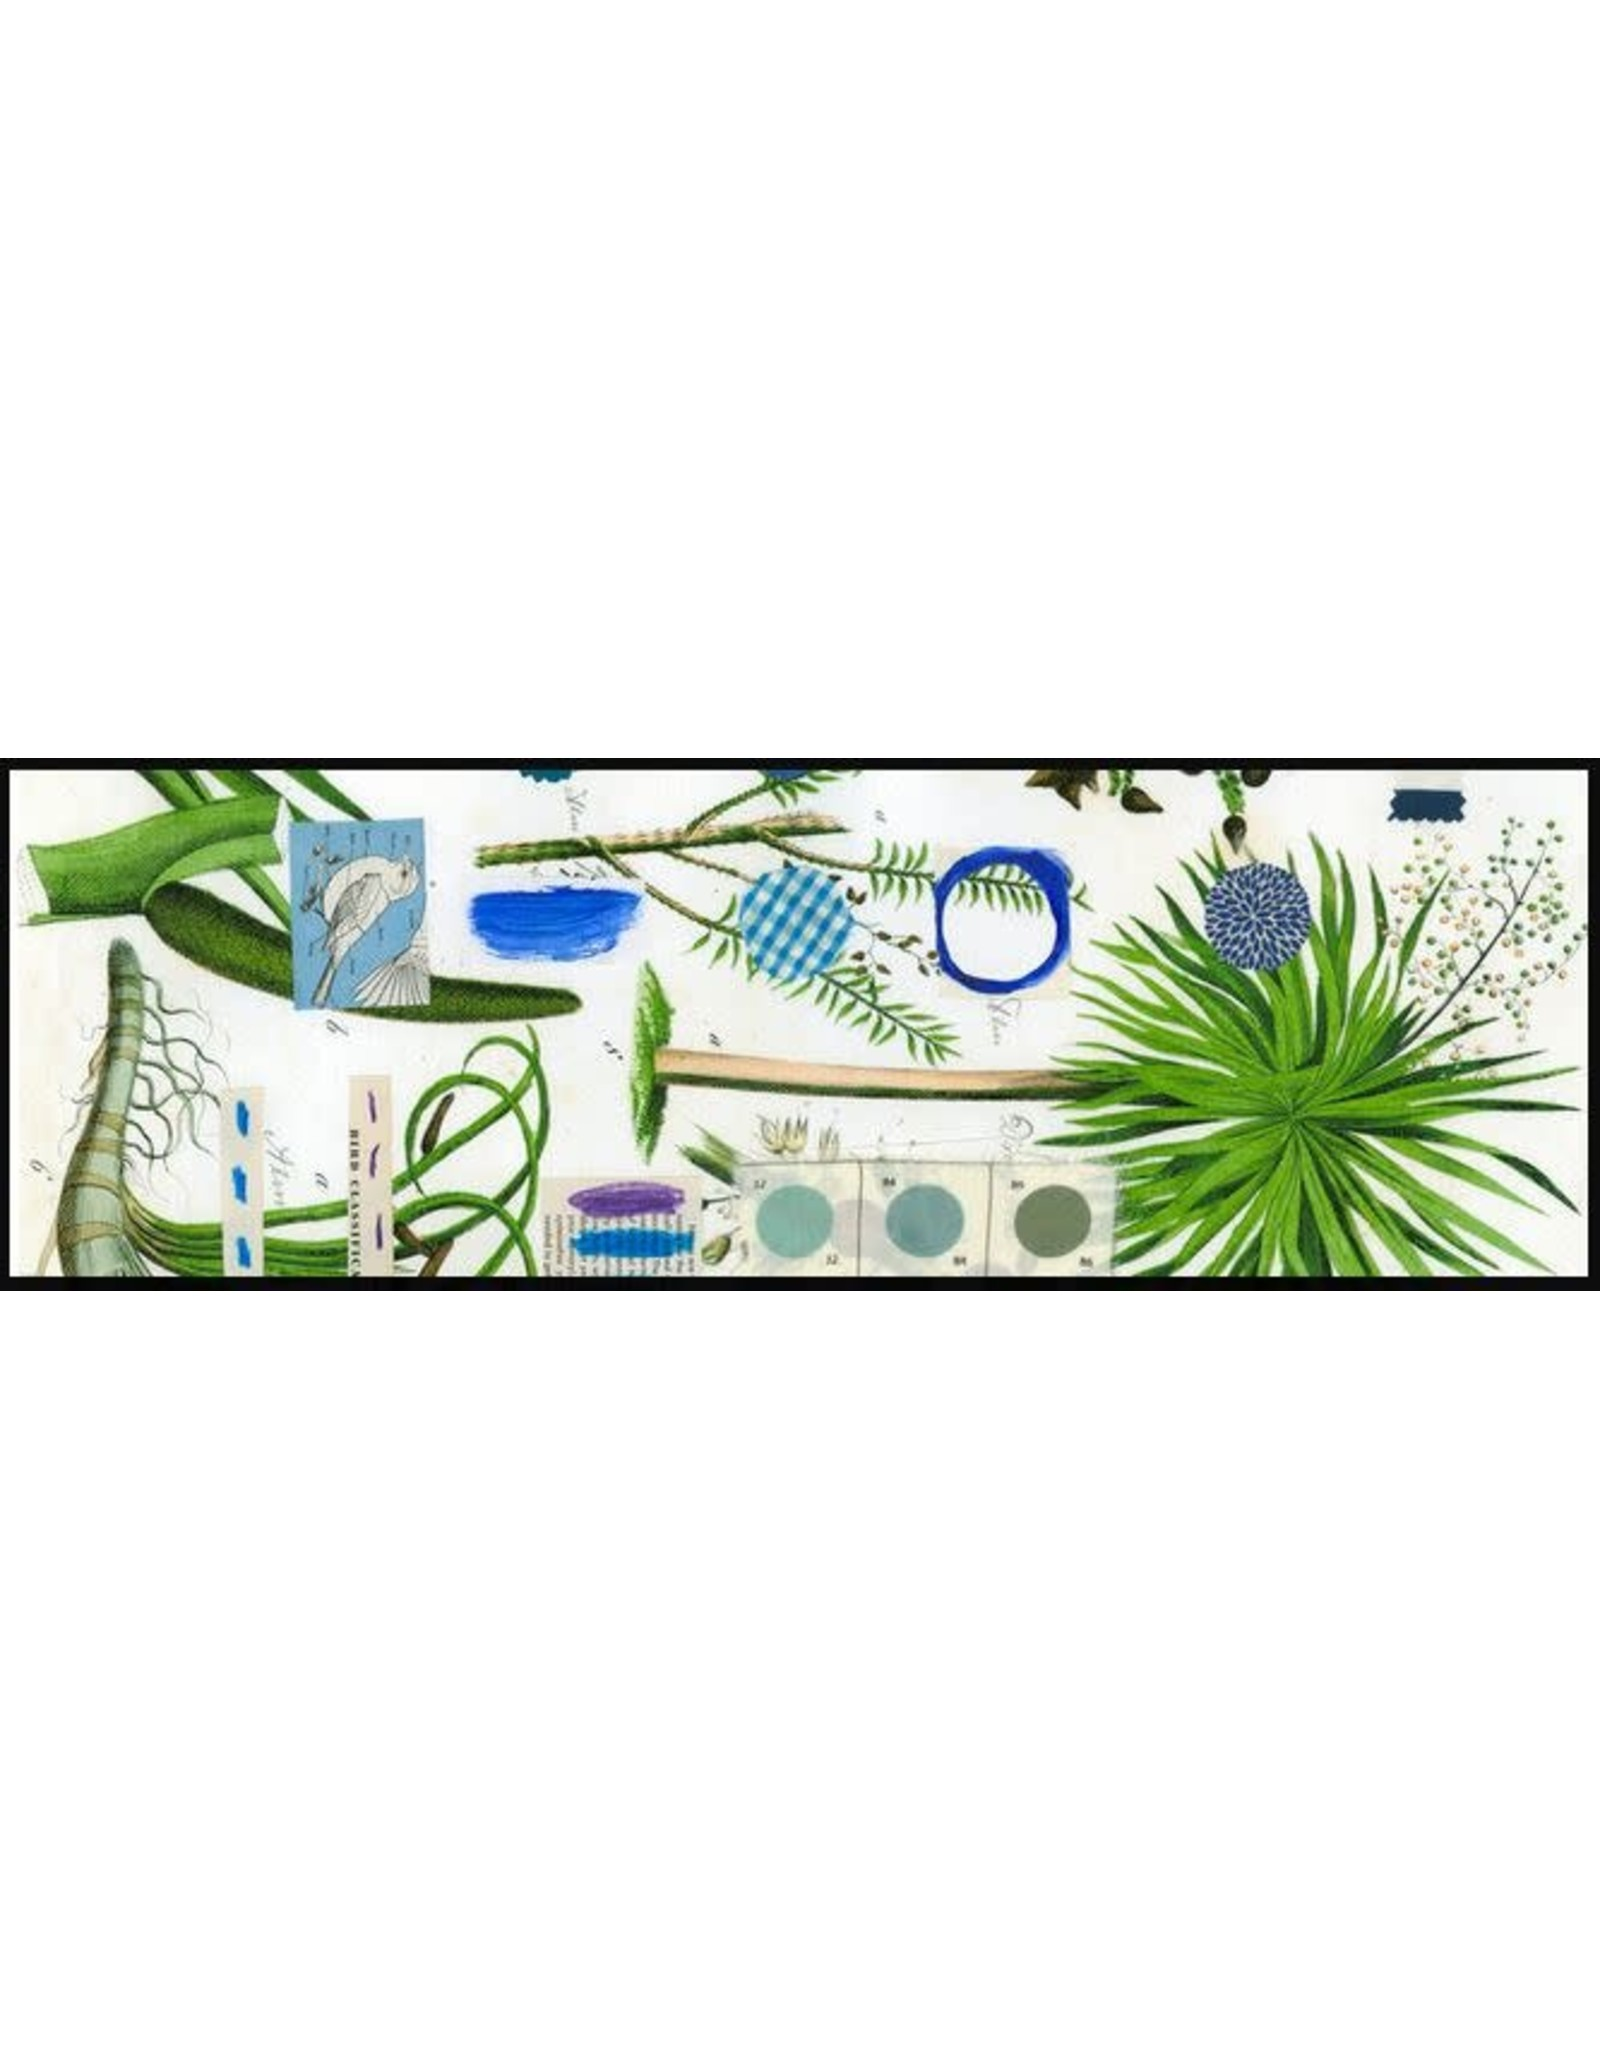 Smilow + Mathiesen Blue Botanical Runner   Pamela Smilow